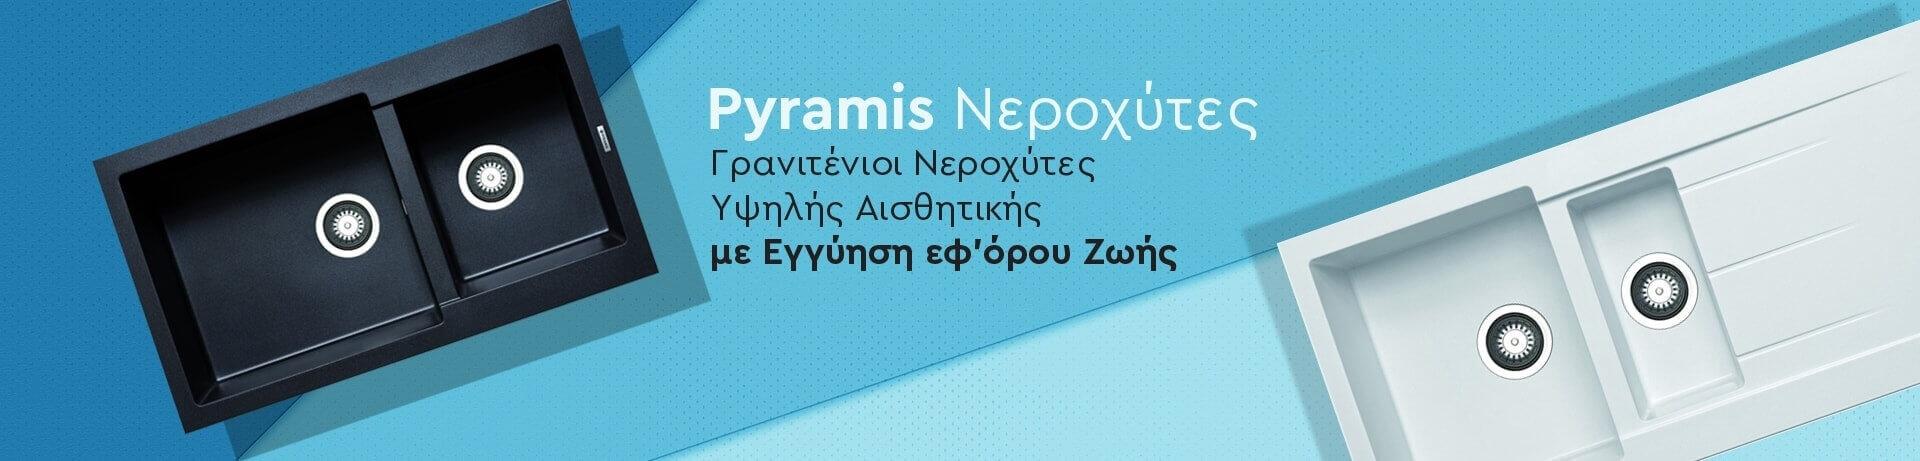 Pyramis Νεροχύτες